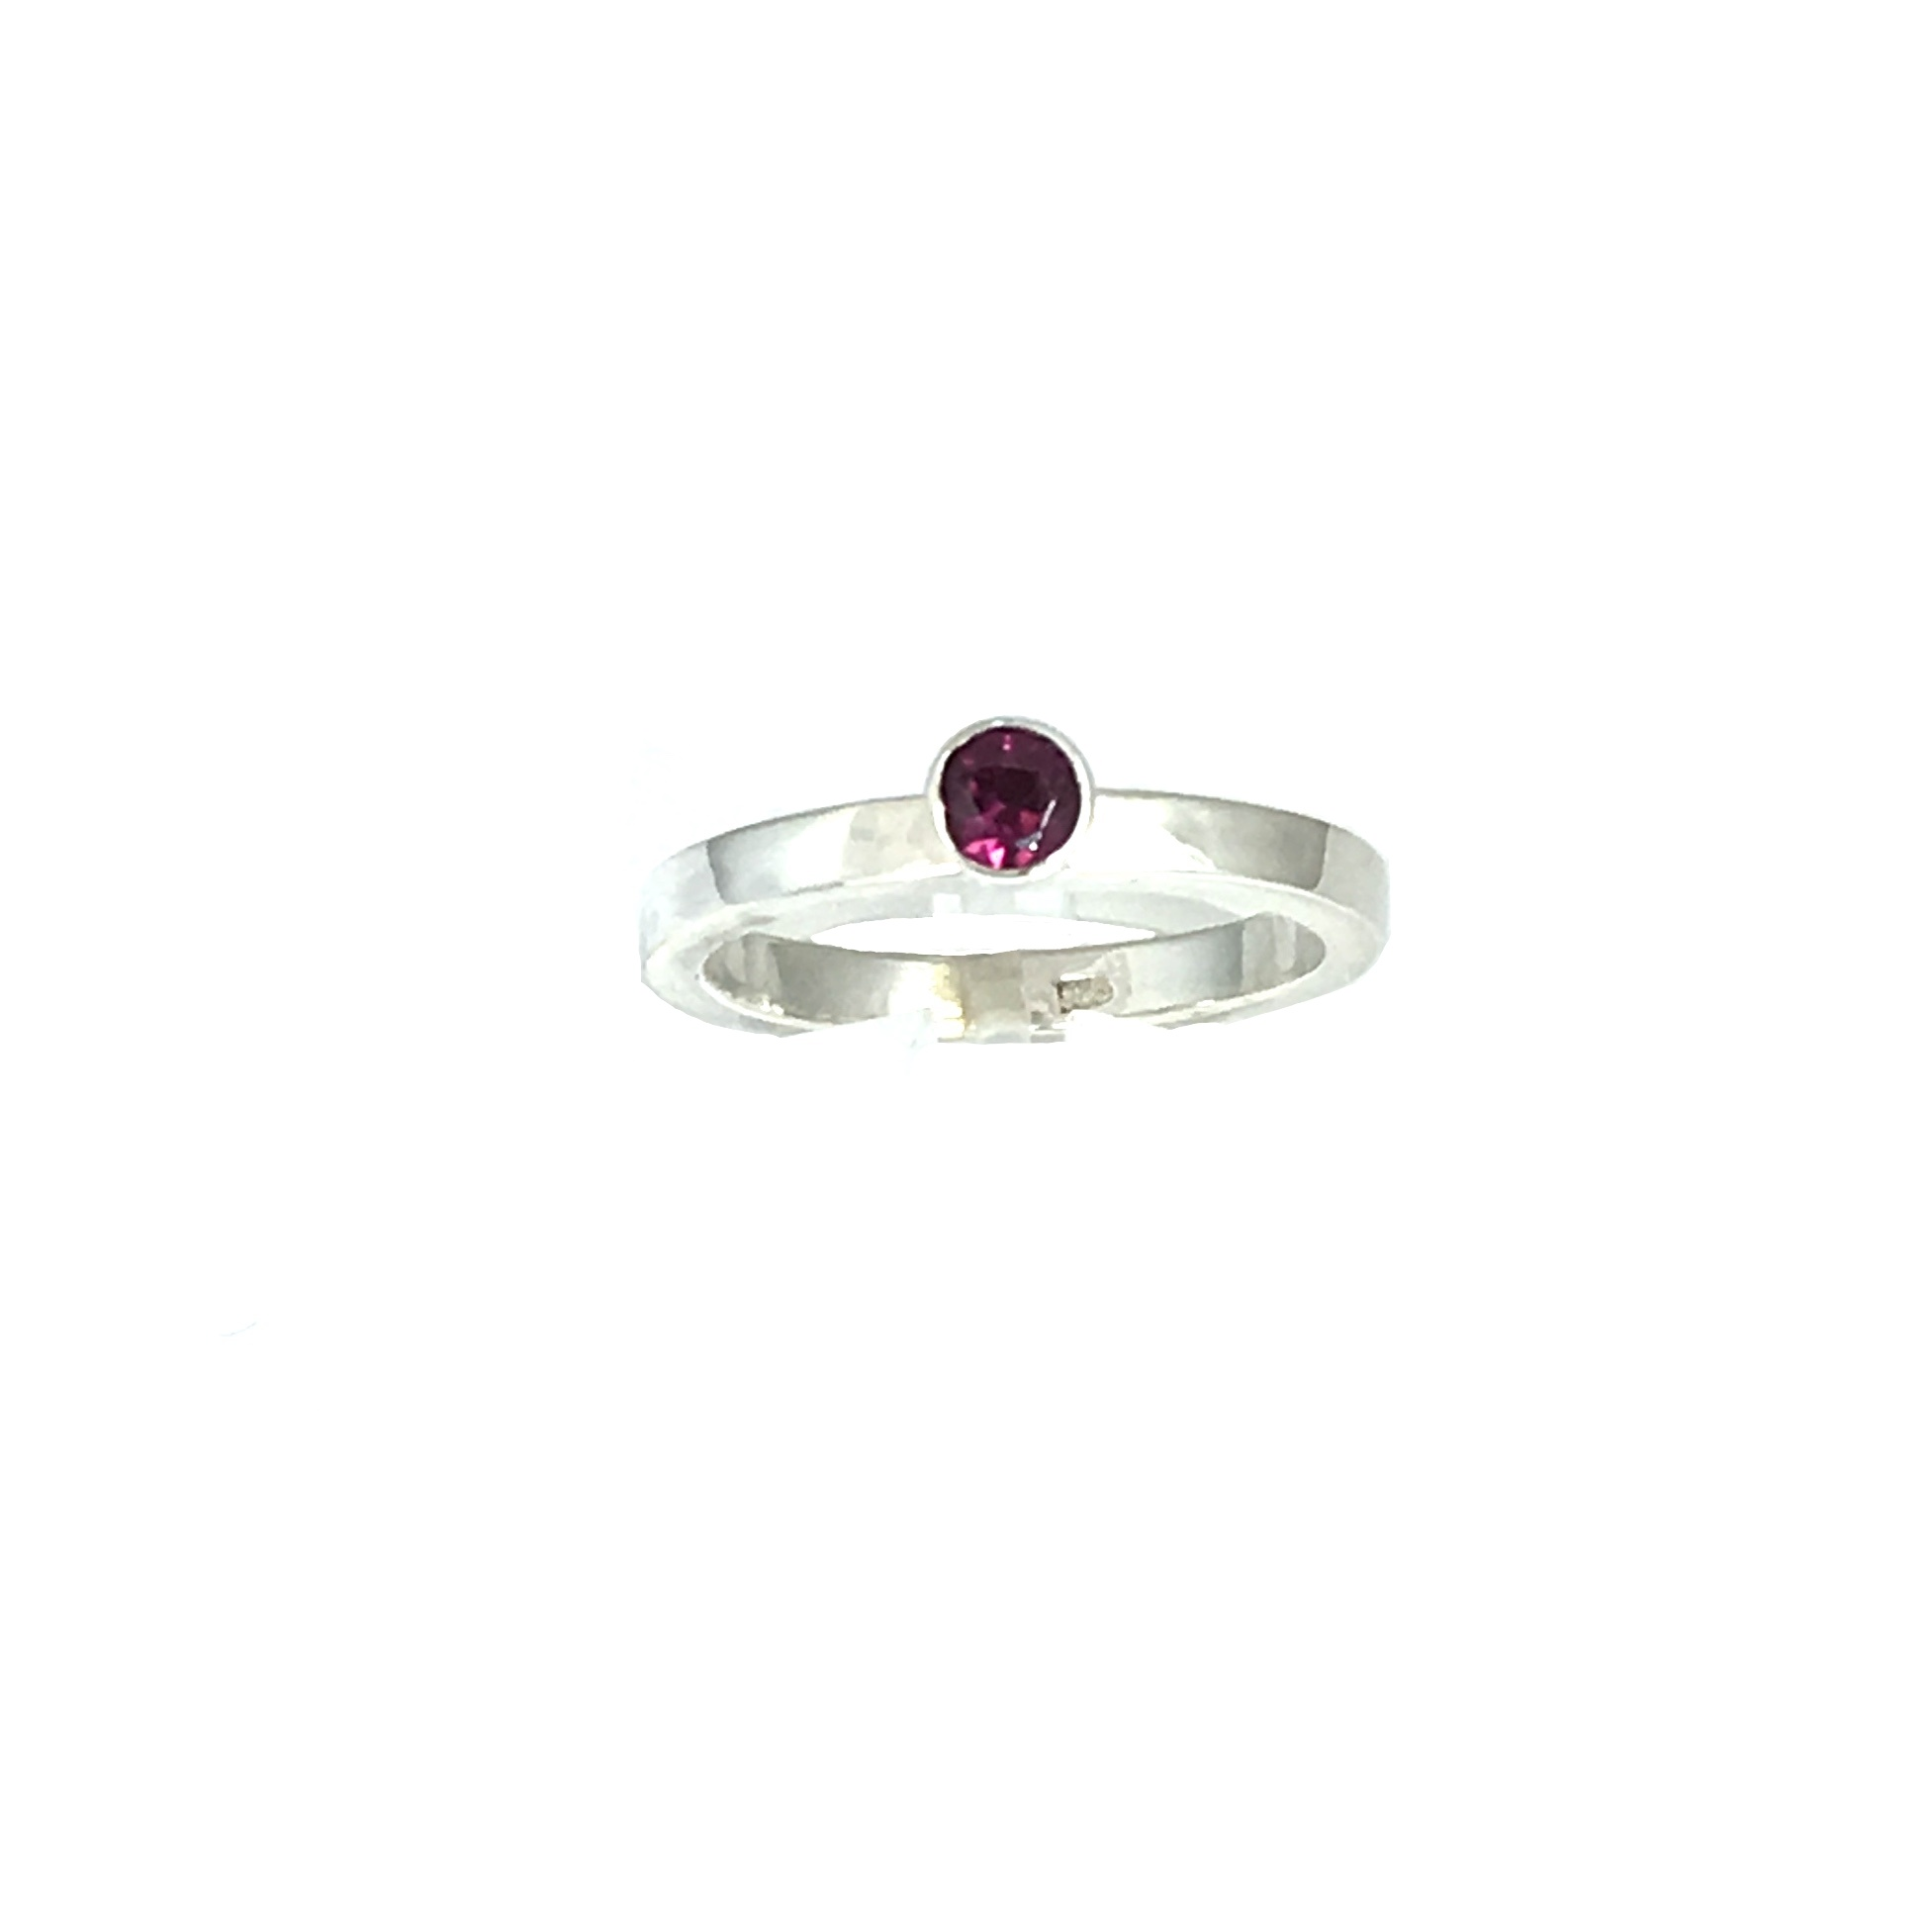 Kiliaan Jewelry Stackable Rings Rhodoliet